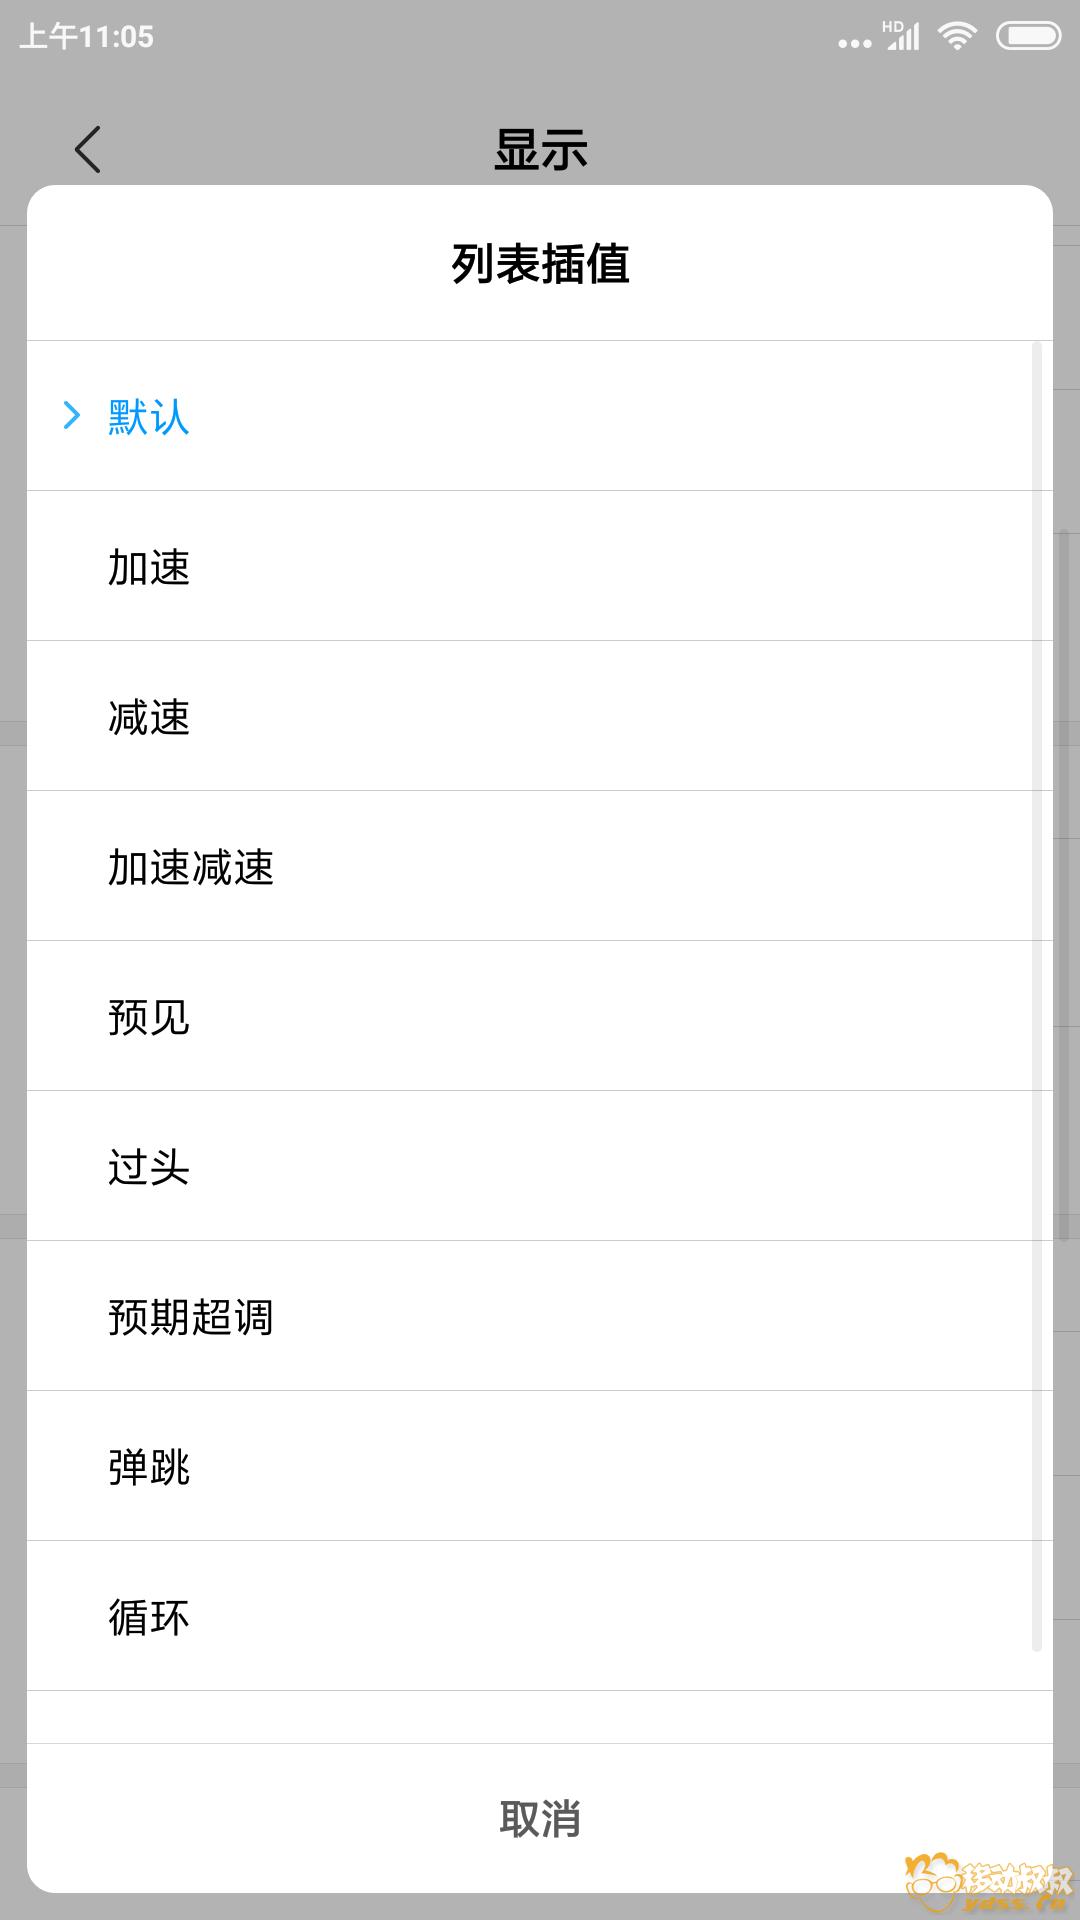 Screenshot_2018-07-02-11-05-10-603_com.android.settings.png